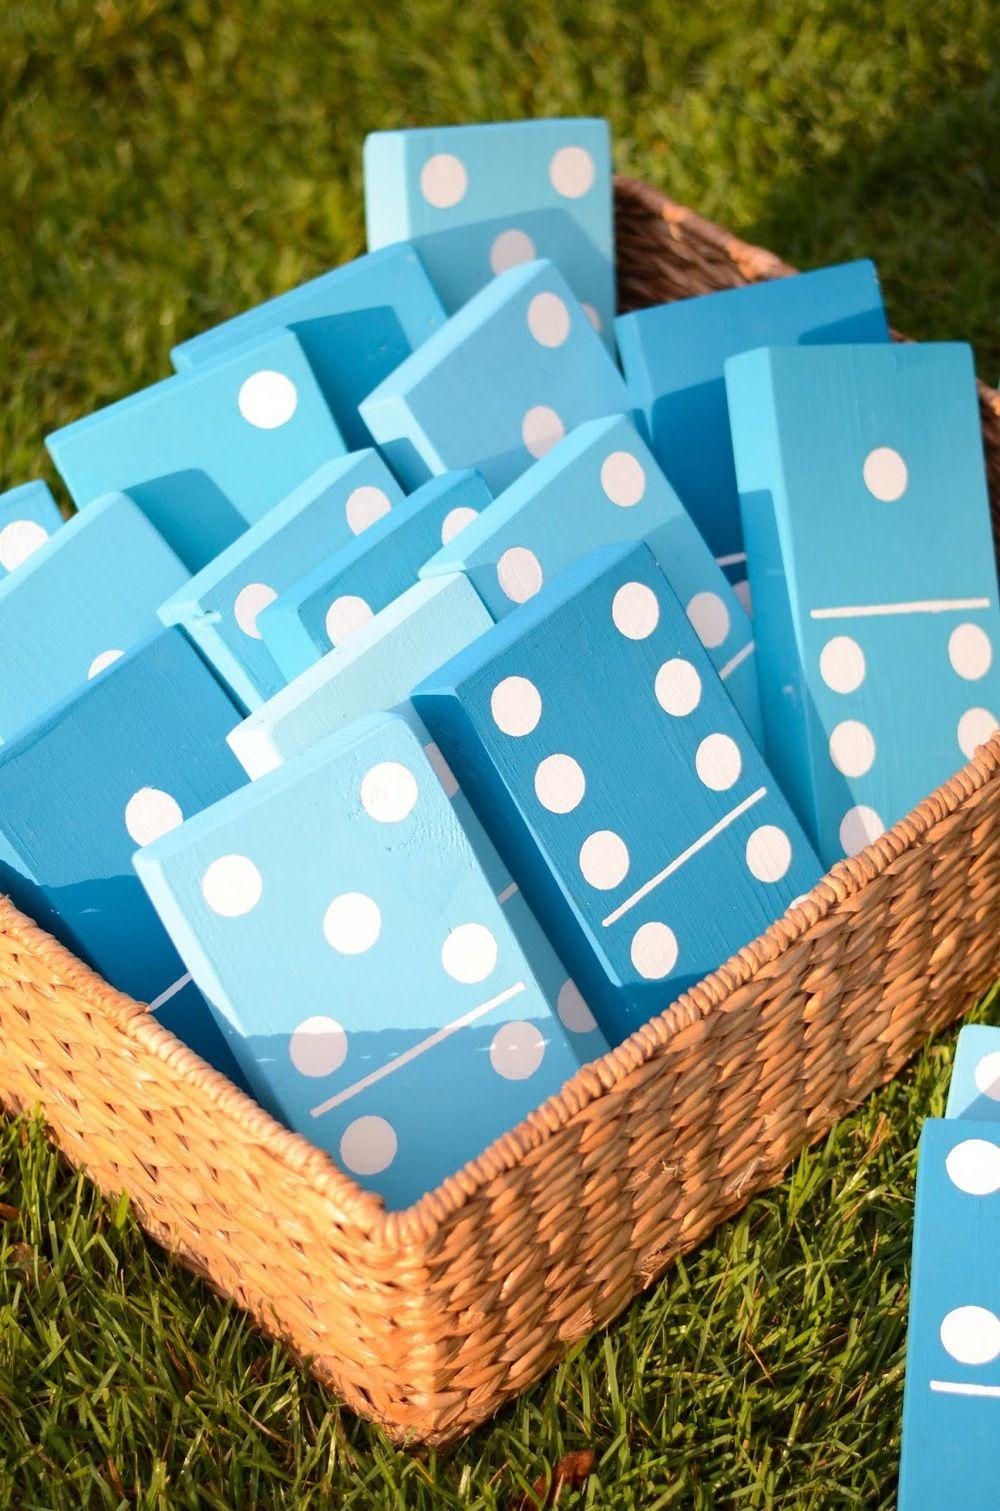 Diy Lawn Dominoes How To Stuff Pinterest Yard Games Diy Yard